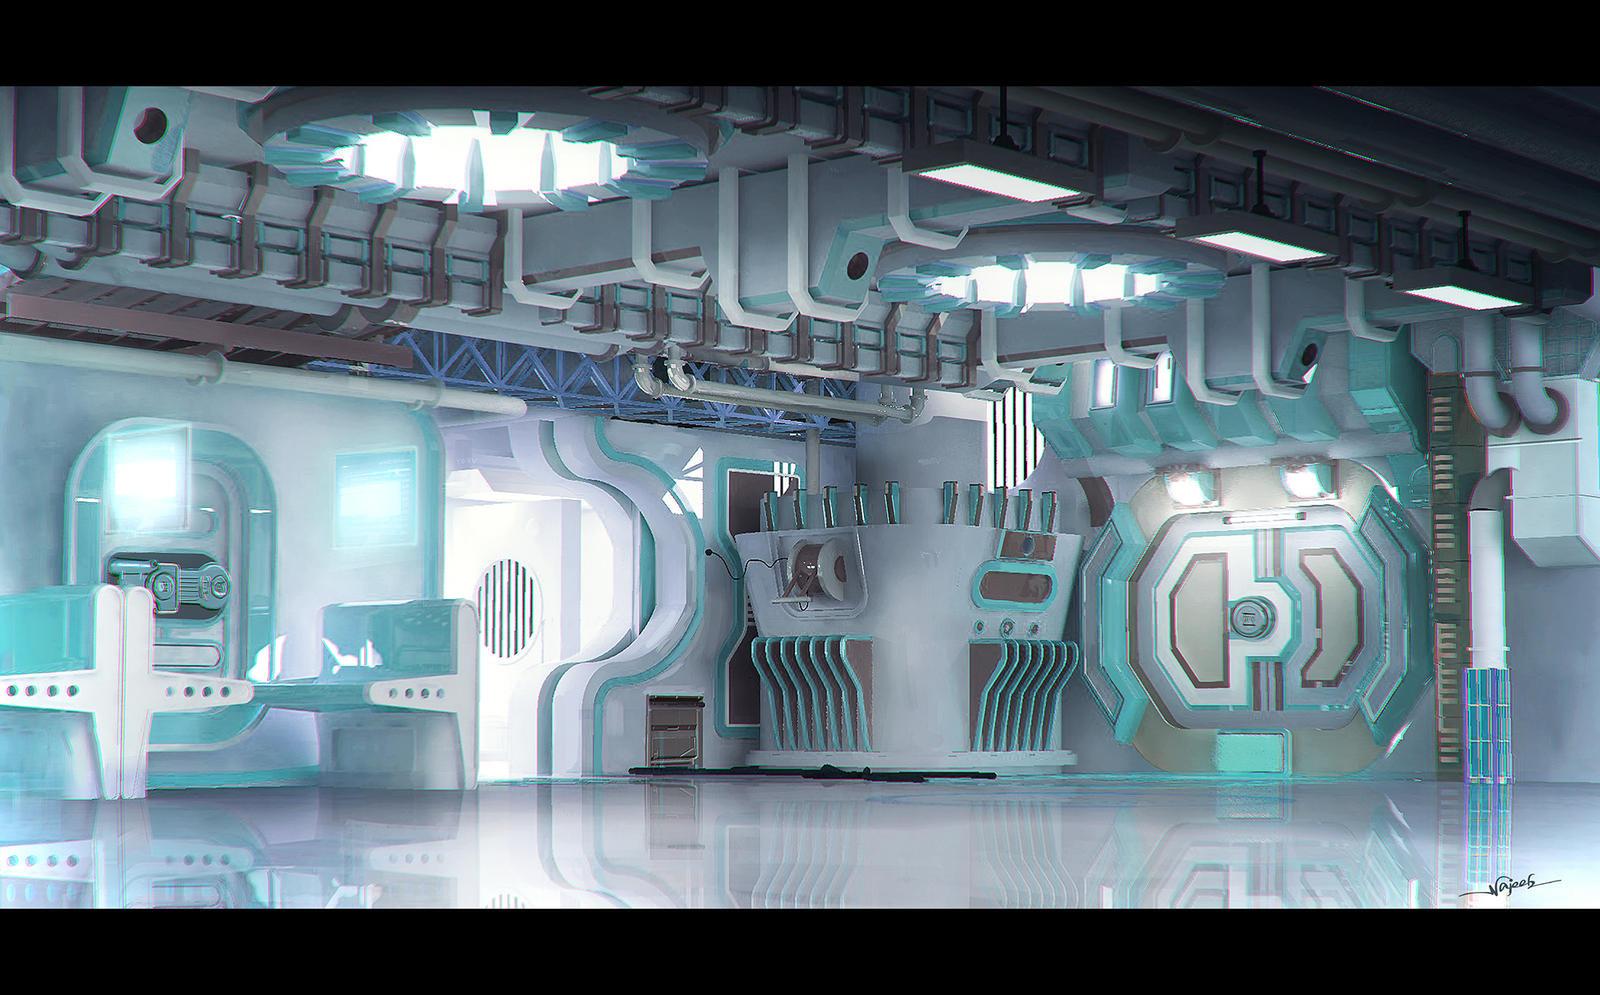 Control room by najeeb alnajjar on deviantart for Futuristic control room